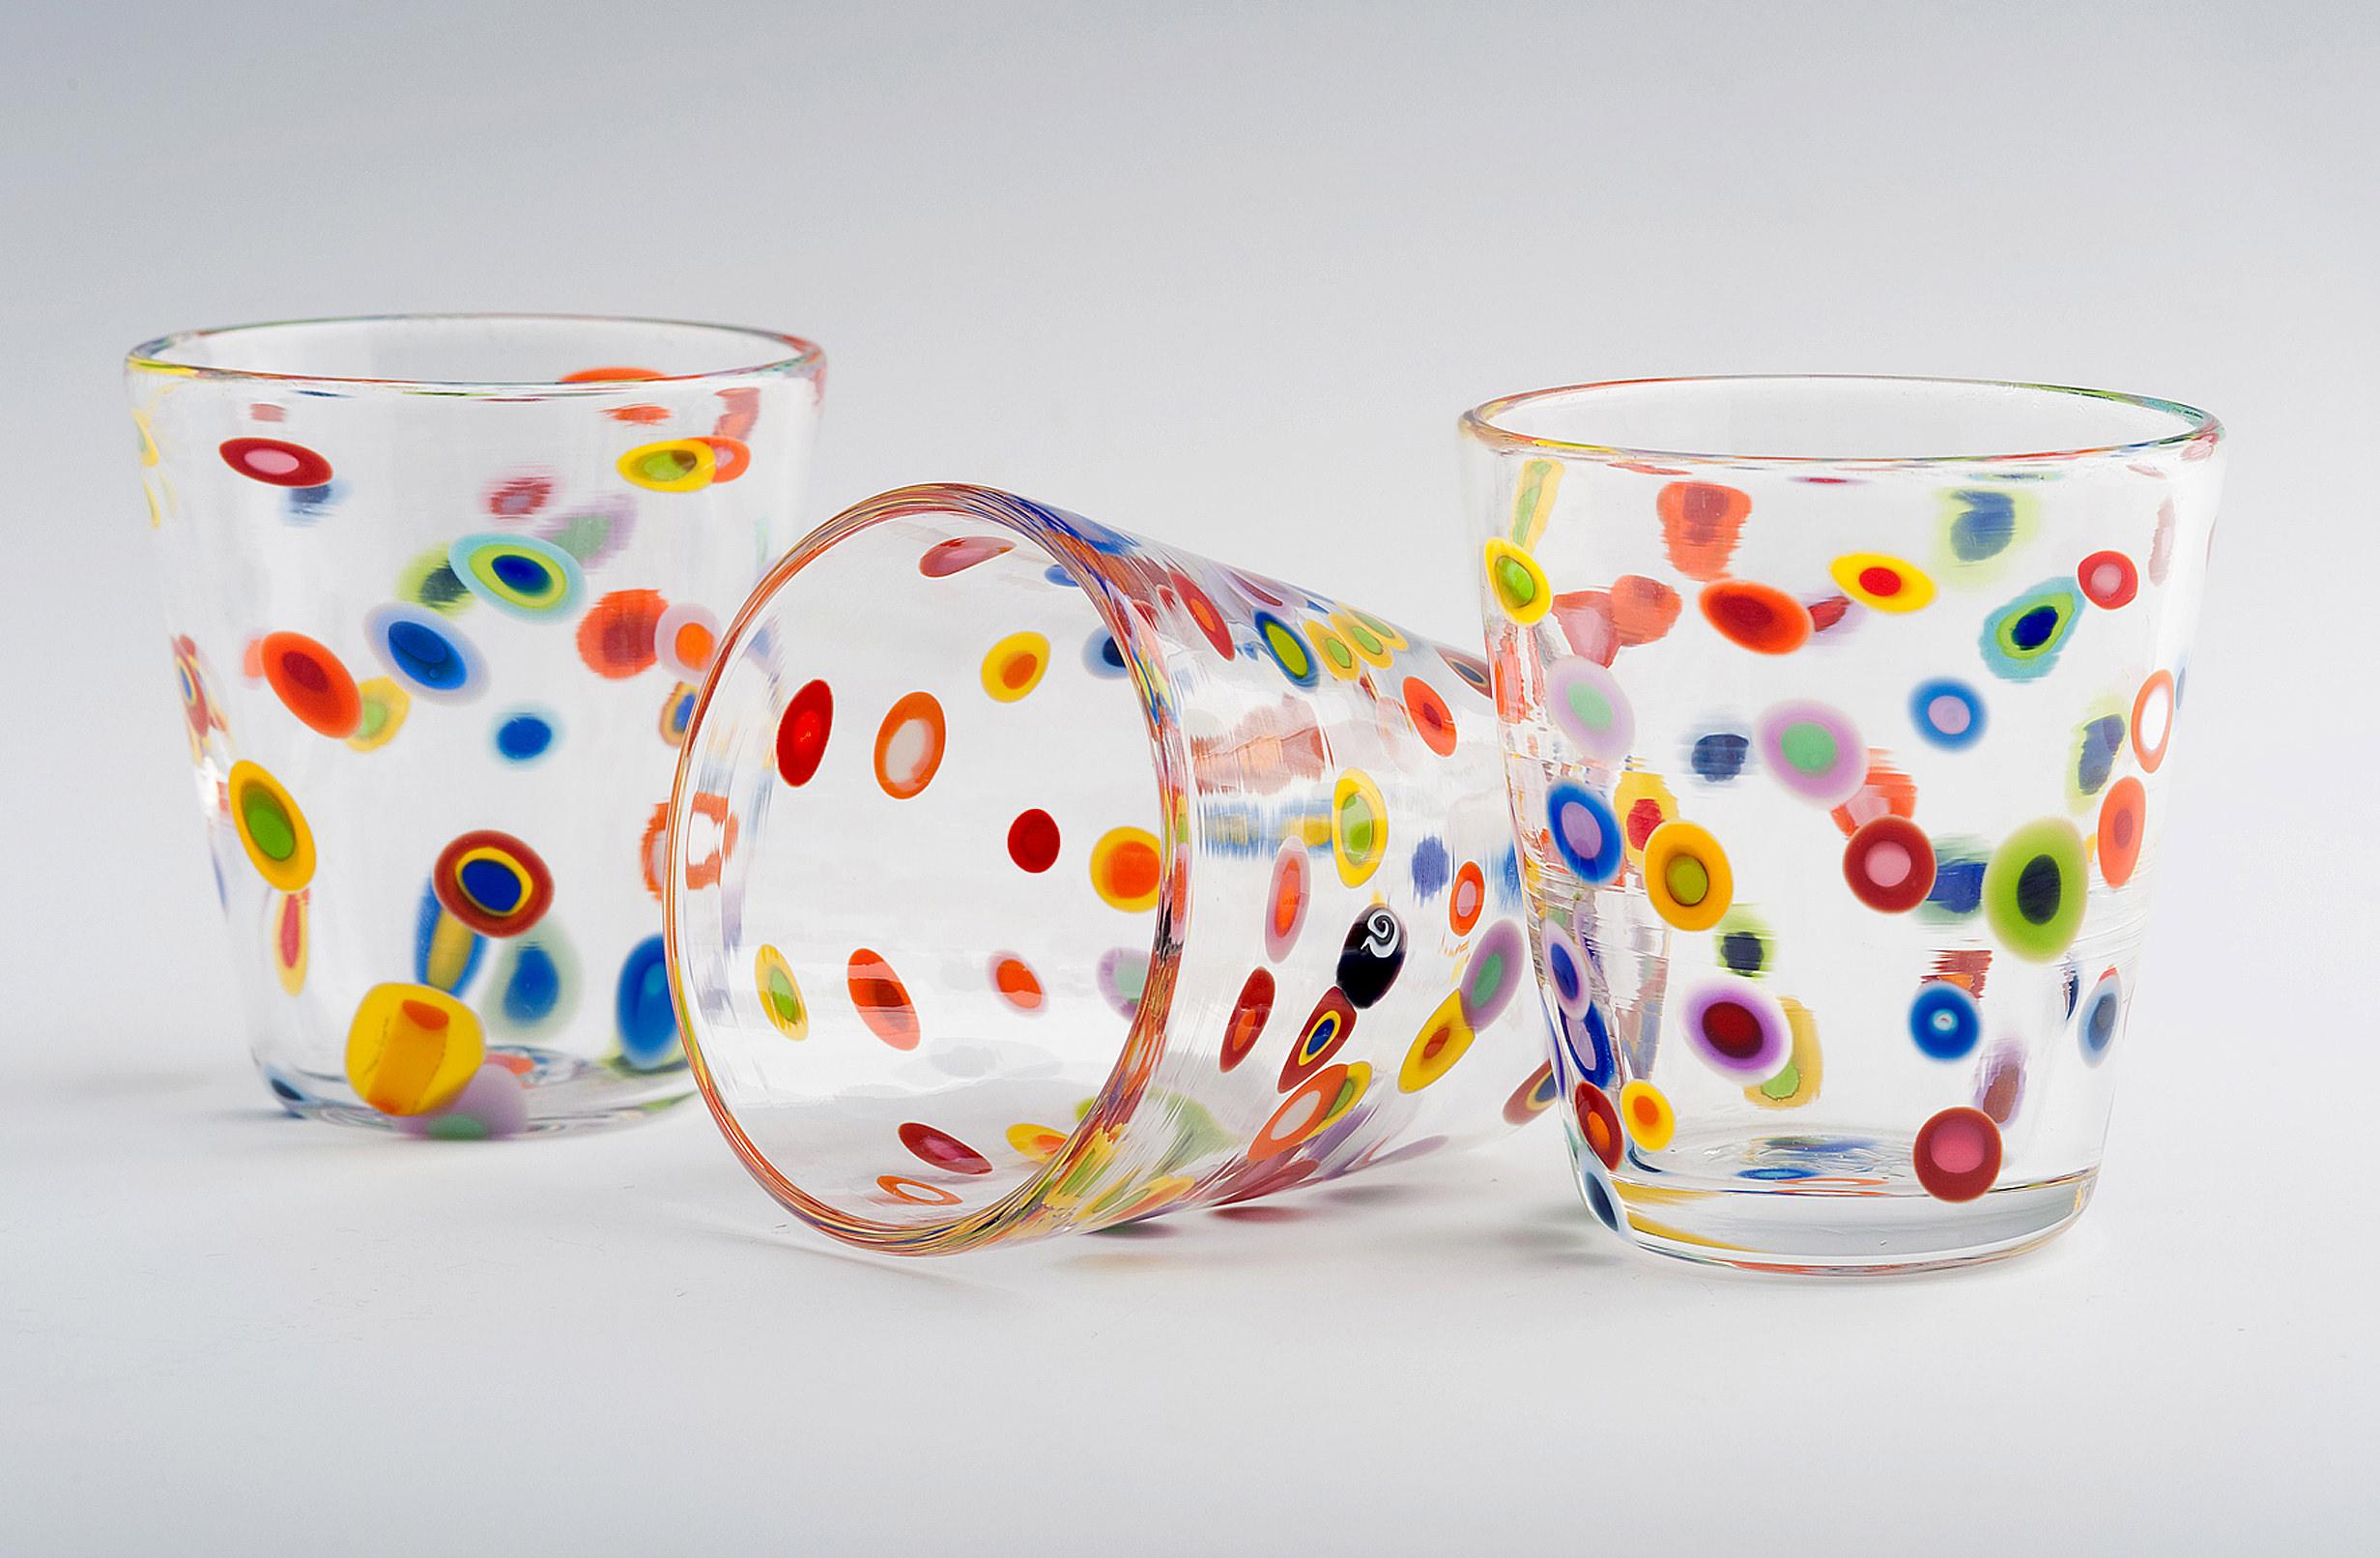 Superfruit Shot Glasses seen here in Superfruit Pattern.